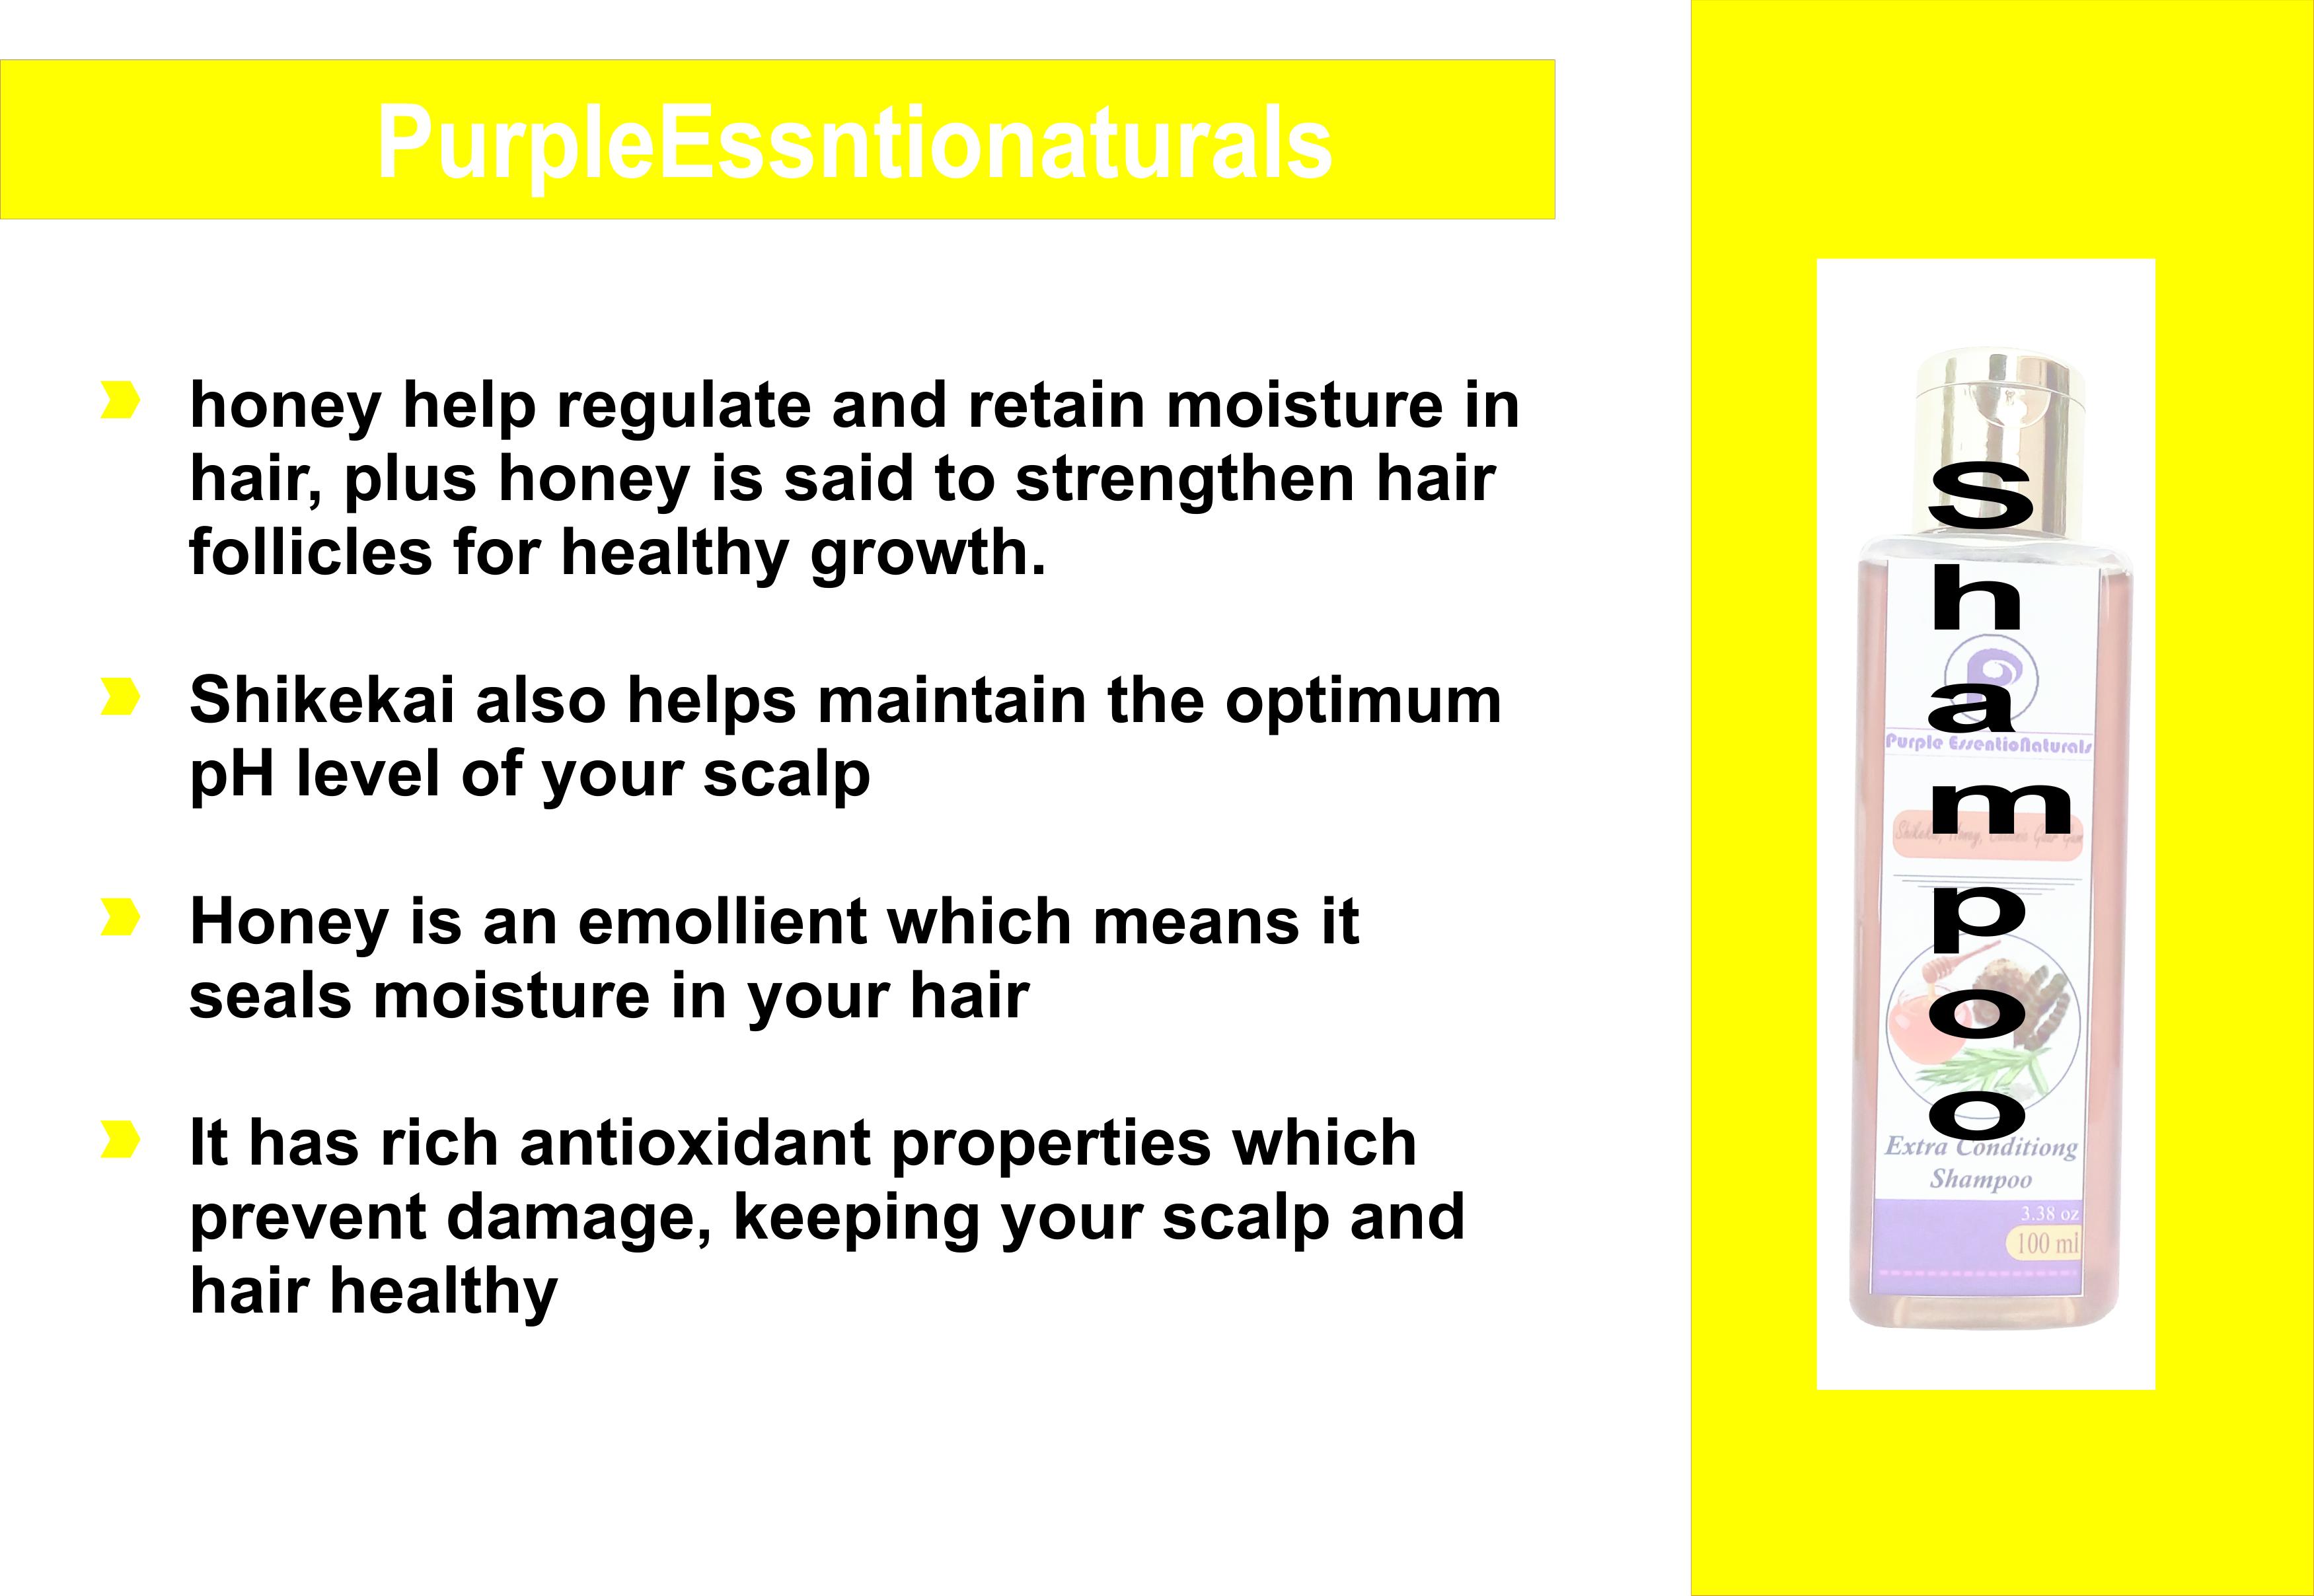 Extra Conditioning Shampoo